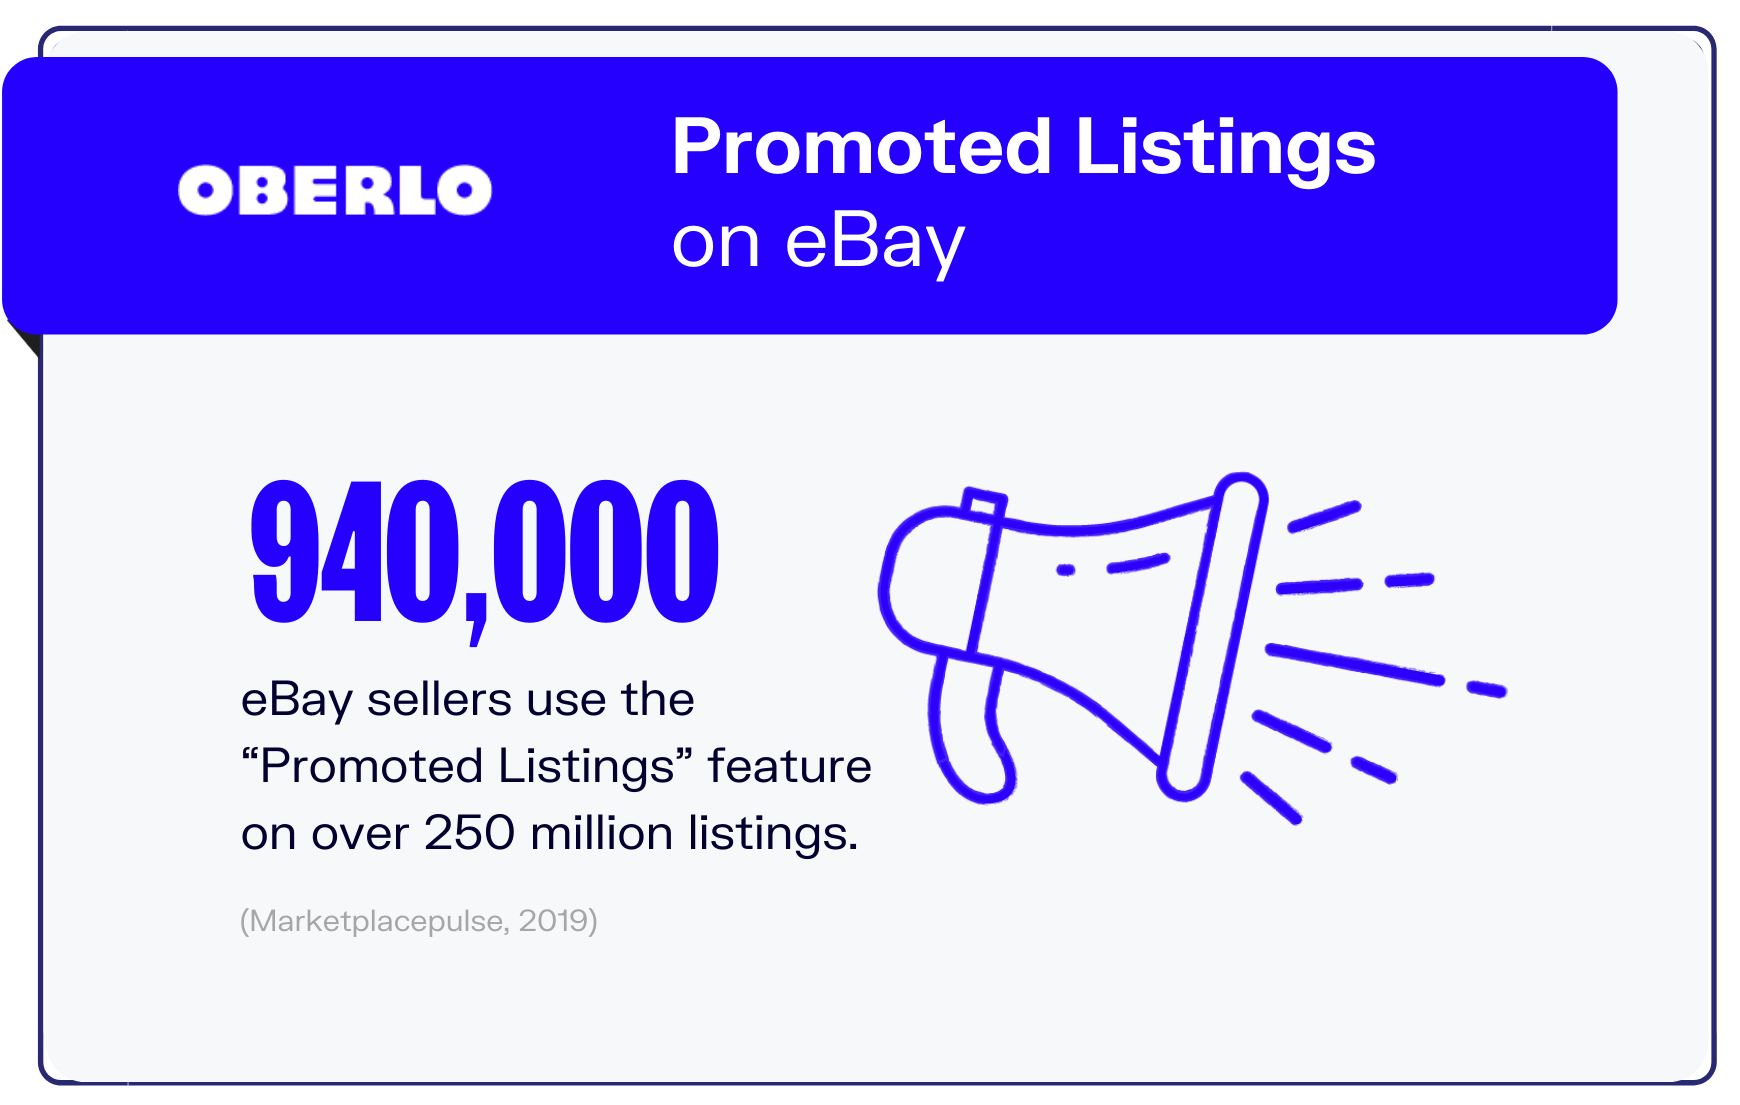 ebay statistics graphic 7